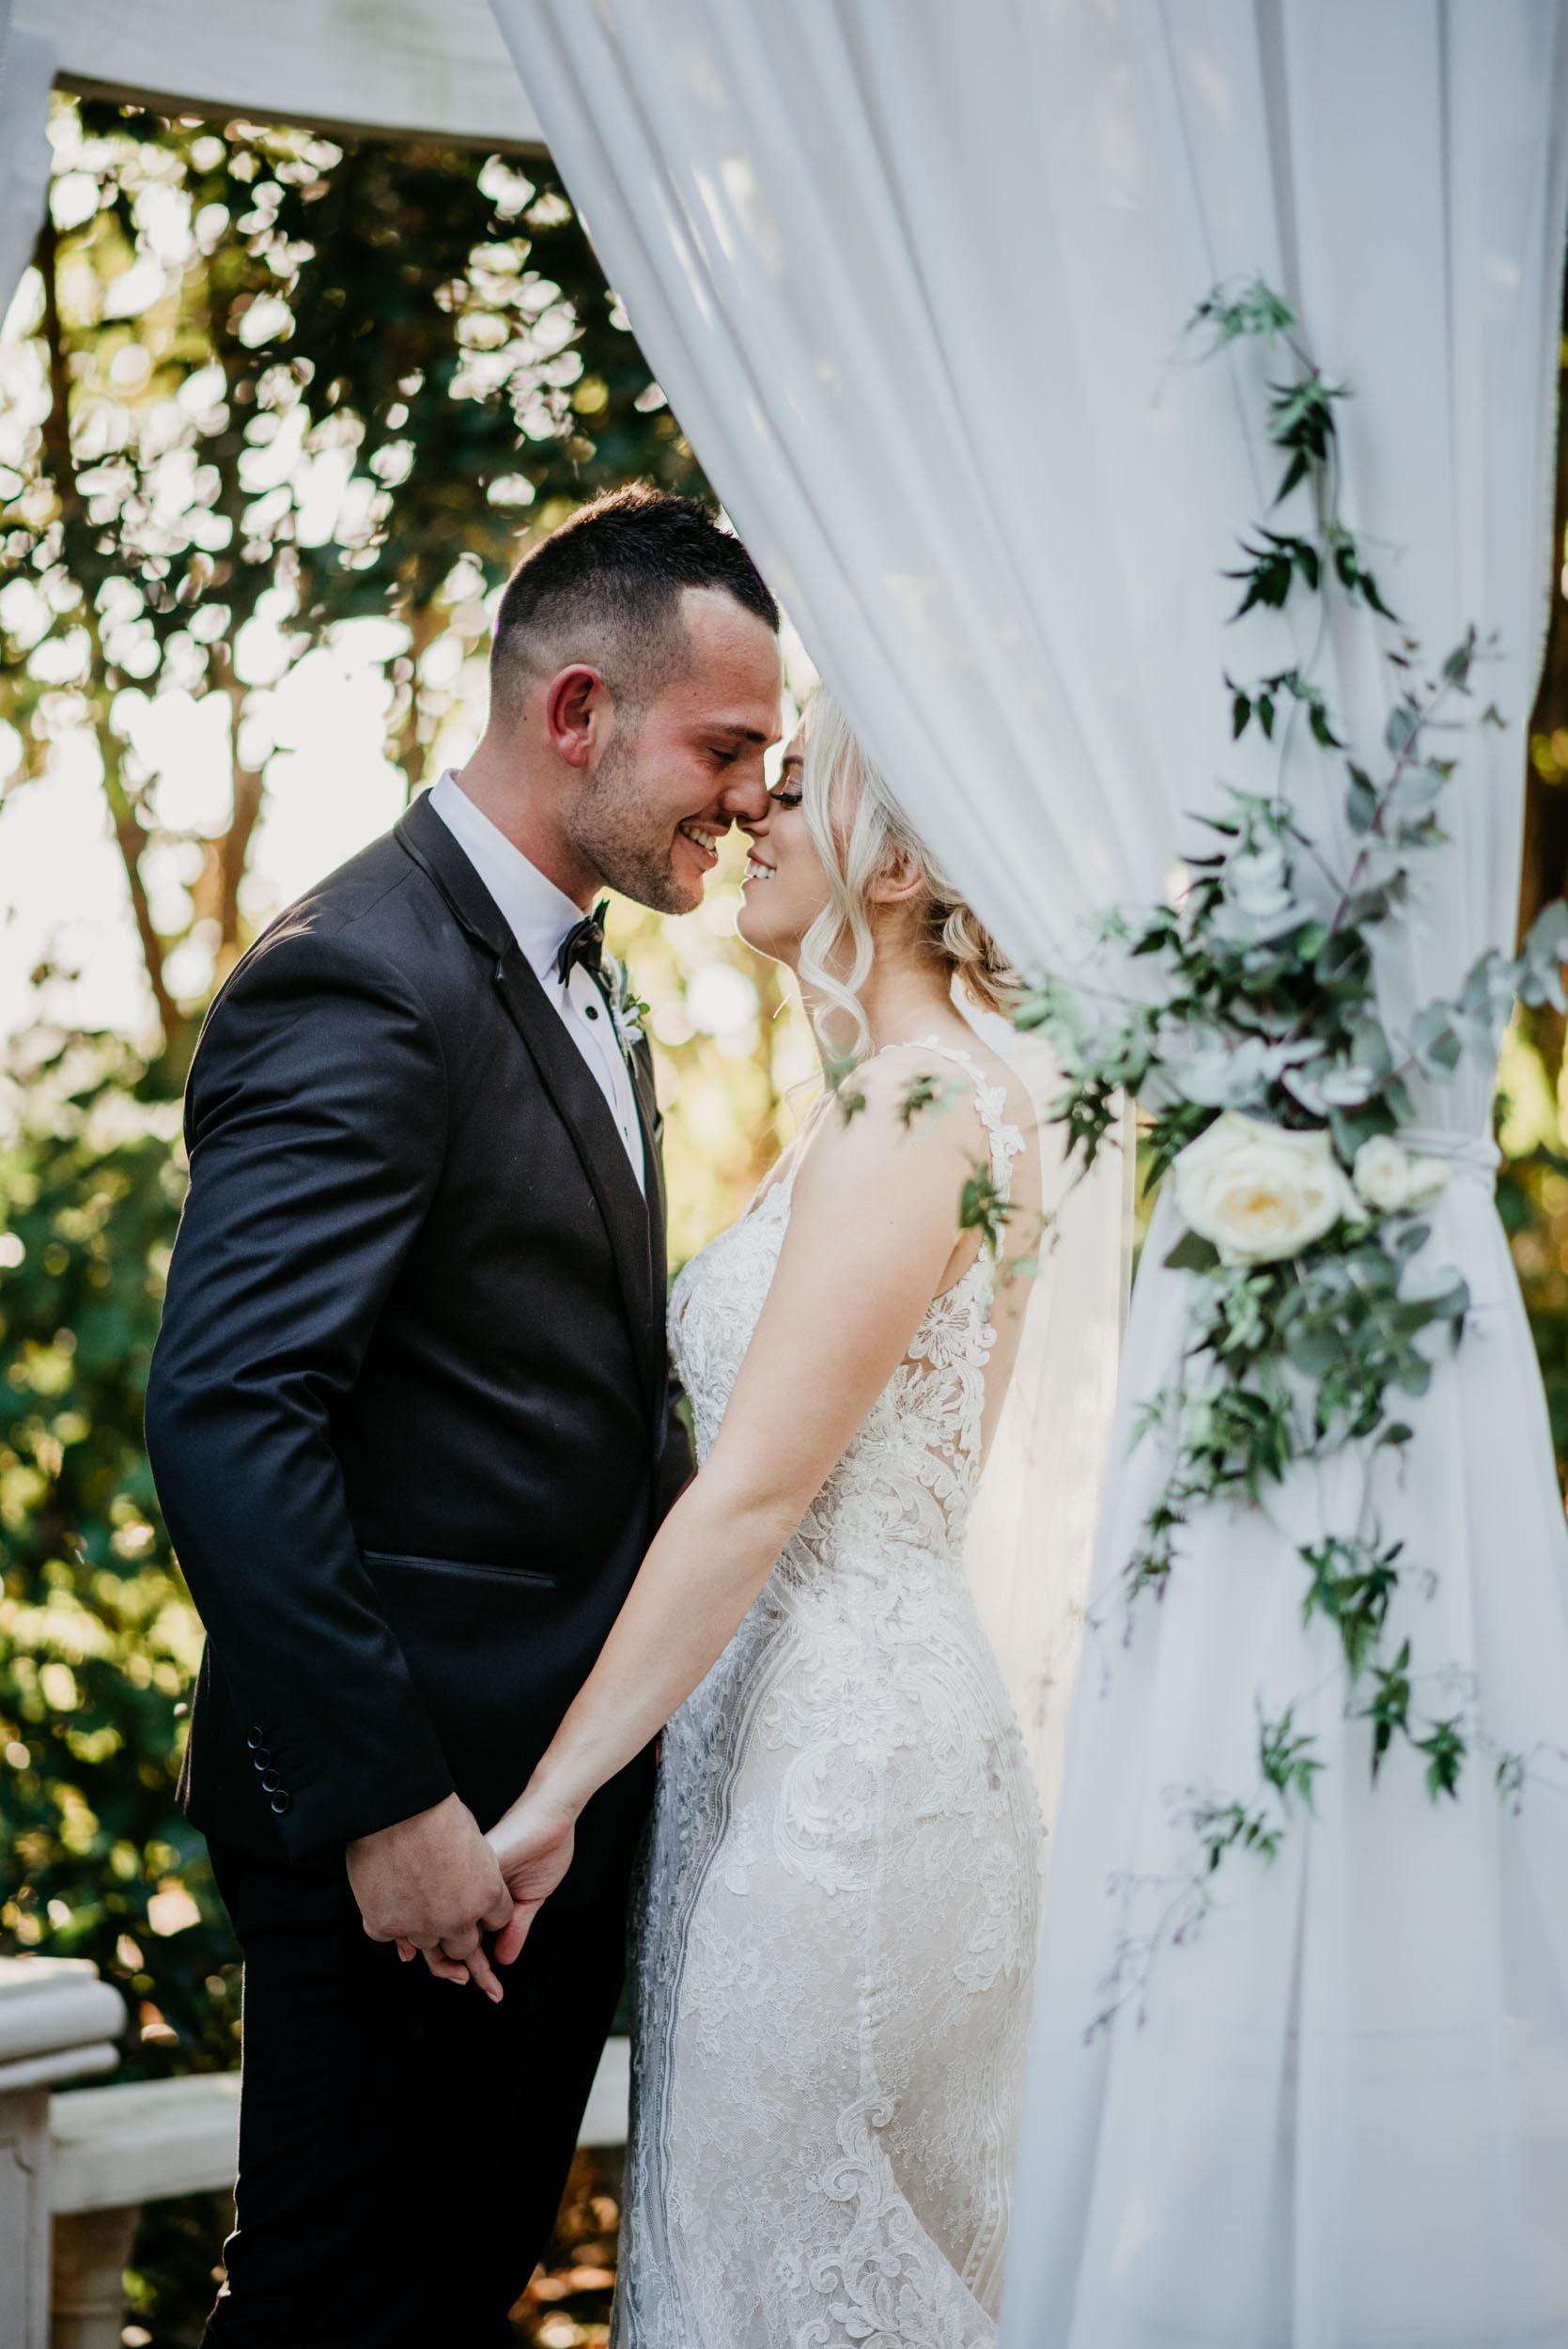 The Raw Photographer - Cairns Wedding Photographer - Laloli - Cairns Garden Wedding - Bride Dress - Destination Wed - Outdoor Reception - Queensland Ceremony-43.jpg